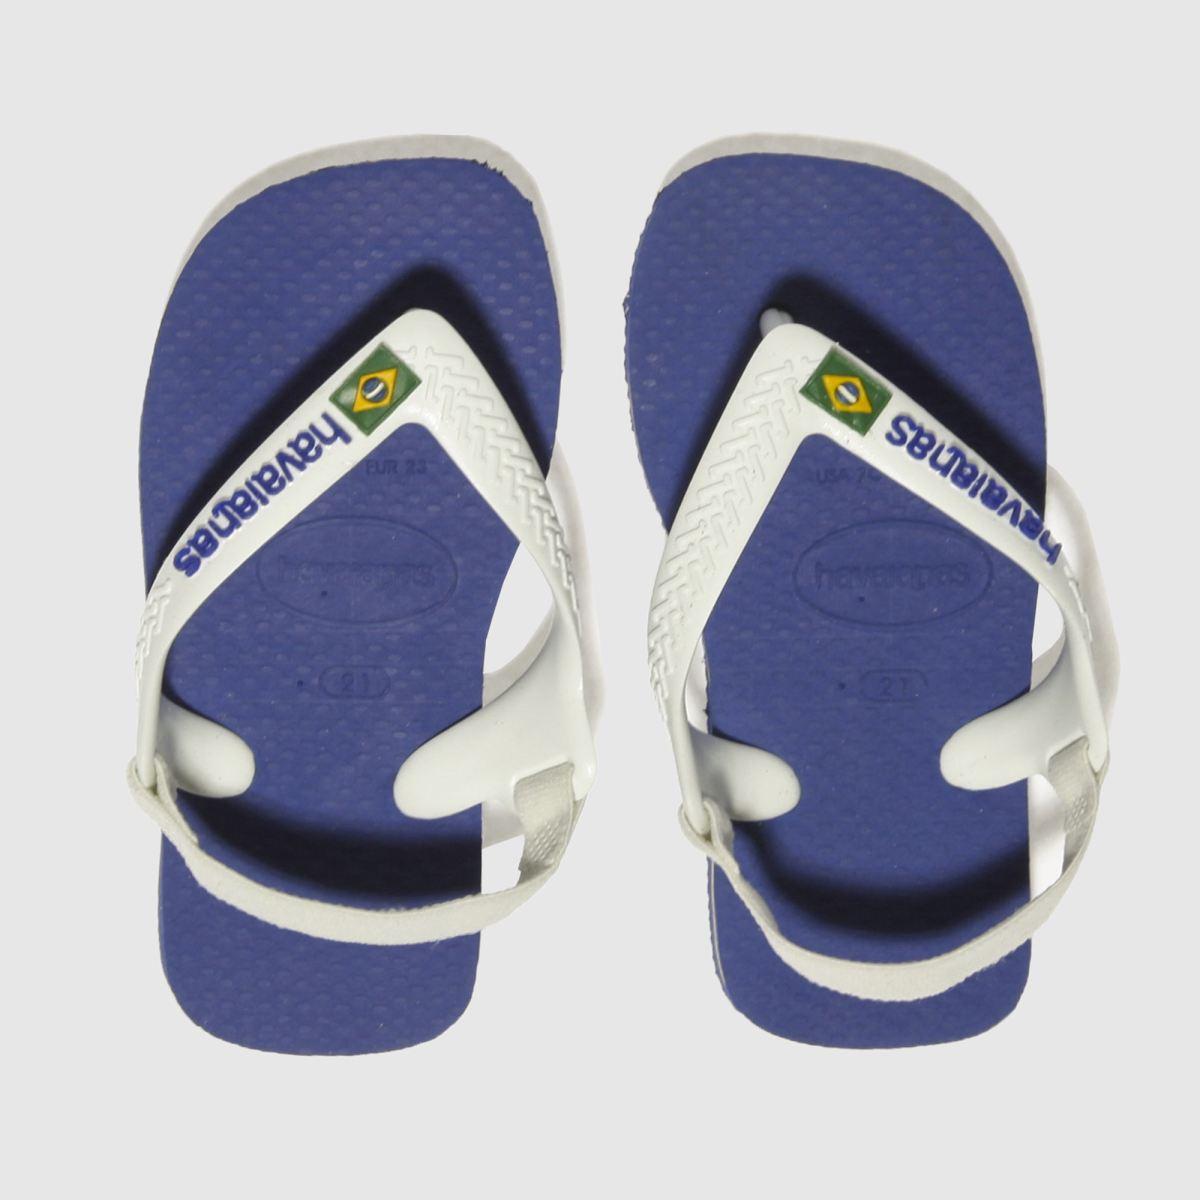 de6813e4b Havaianas Blue Brasil Logo Trainers Toddler - Schuh at Westquay - Shop  Online